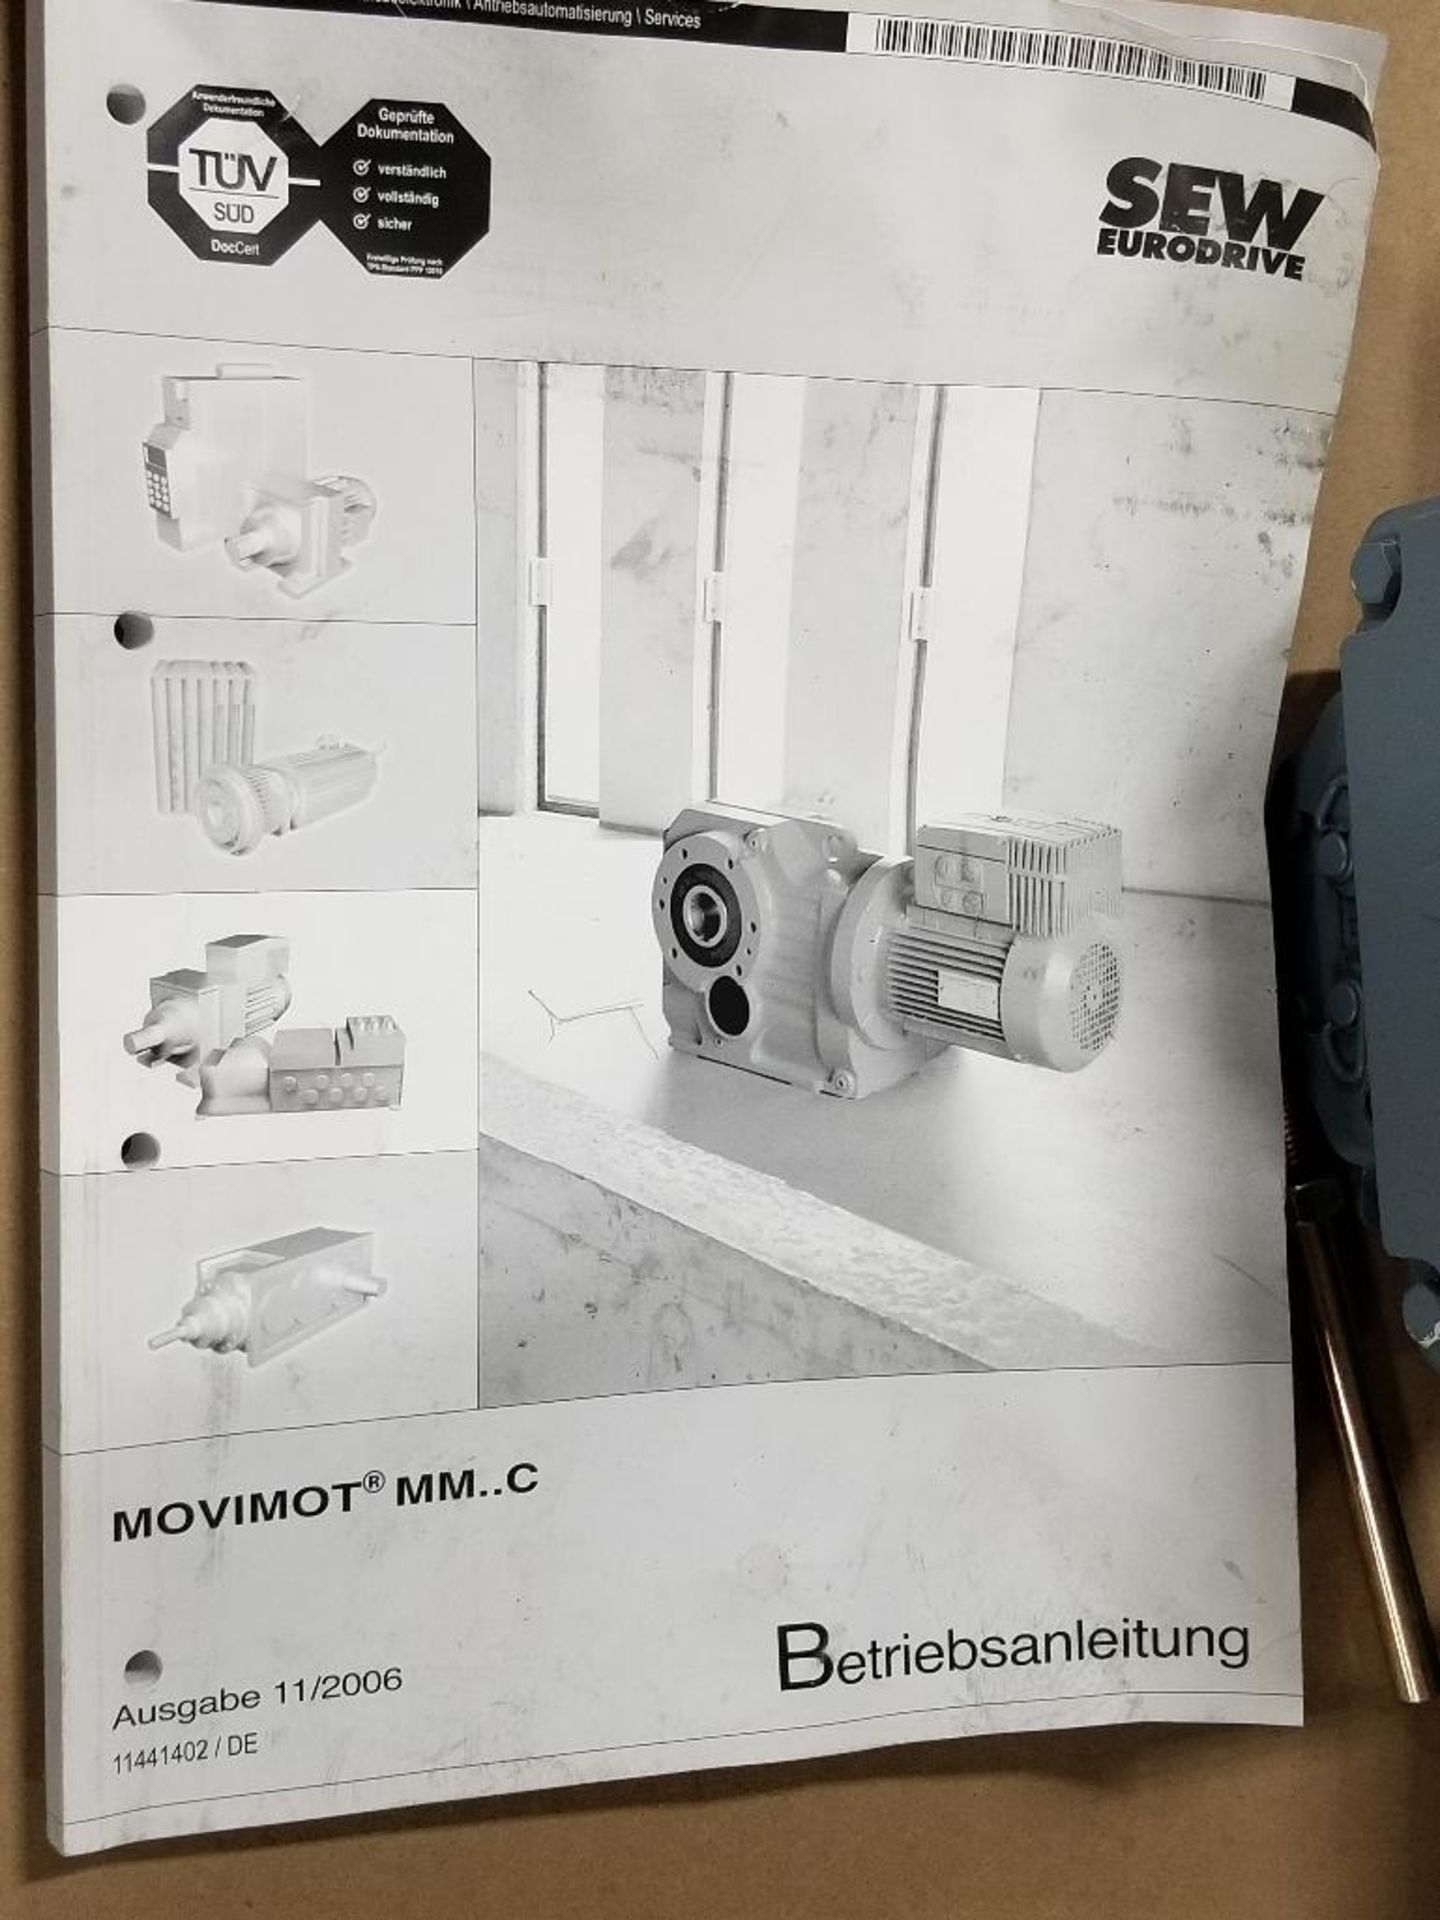 0.37kW Sew-Eurodrive Type-HS40 Motor. 01.1276862401.0001.09 400/460V, 1380/1680RPM. - Image 5 of 5